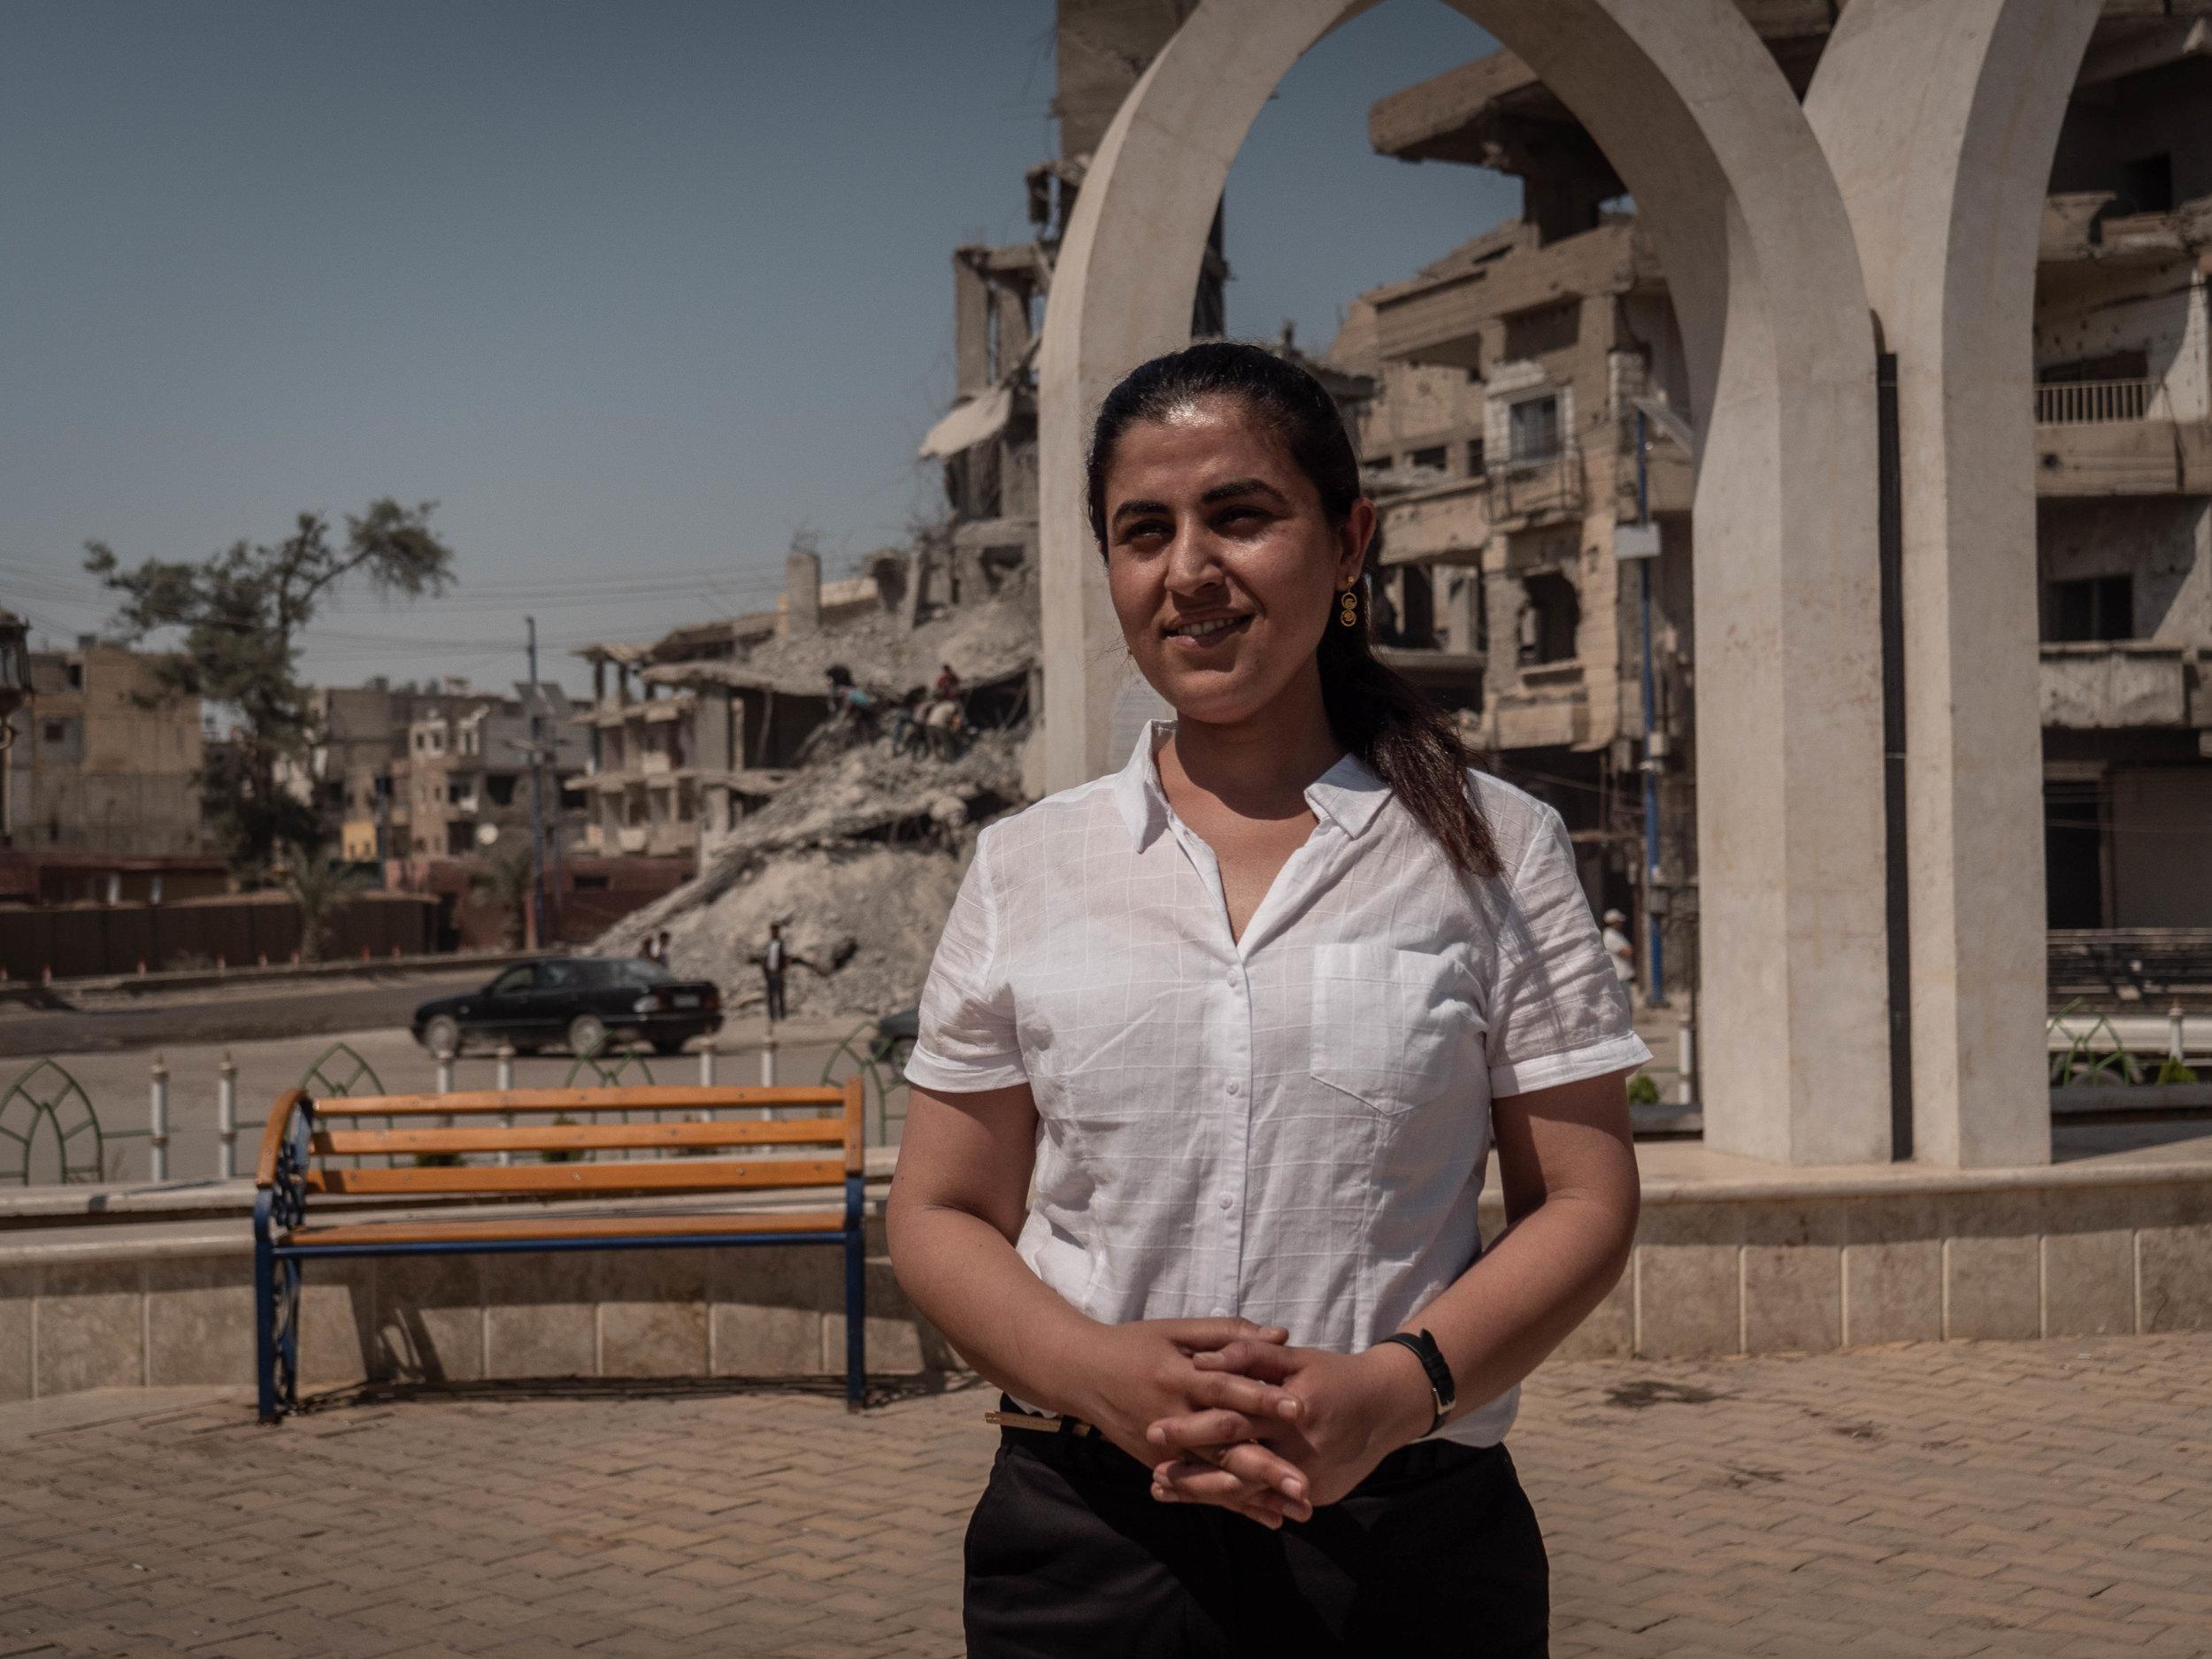 29/05/19, Raqqa, Syria - The mayor of Raqqa Leila Mustafa - she has been appointed mayor by the SDF.